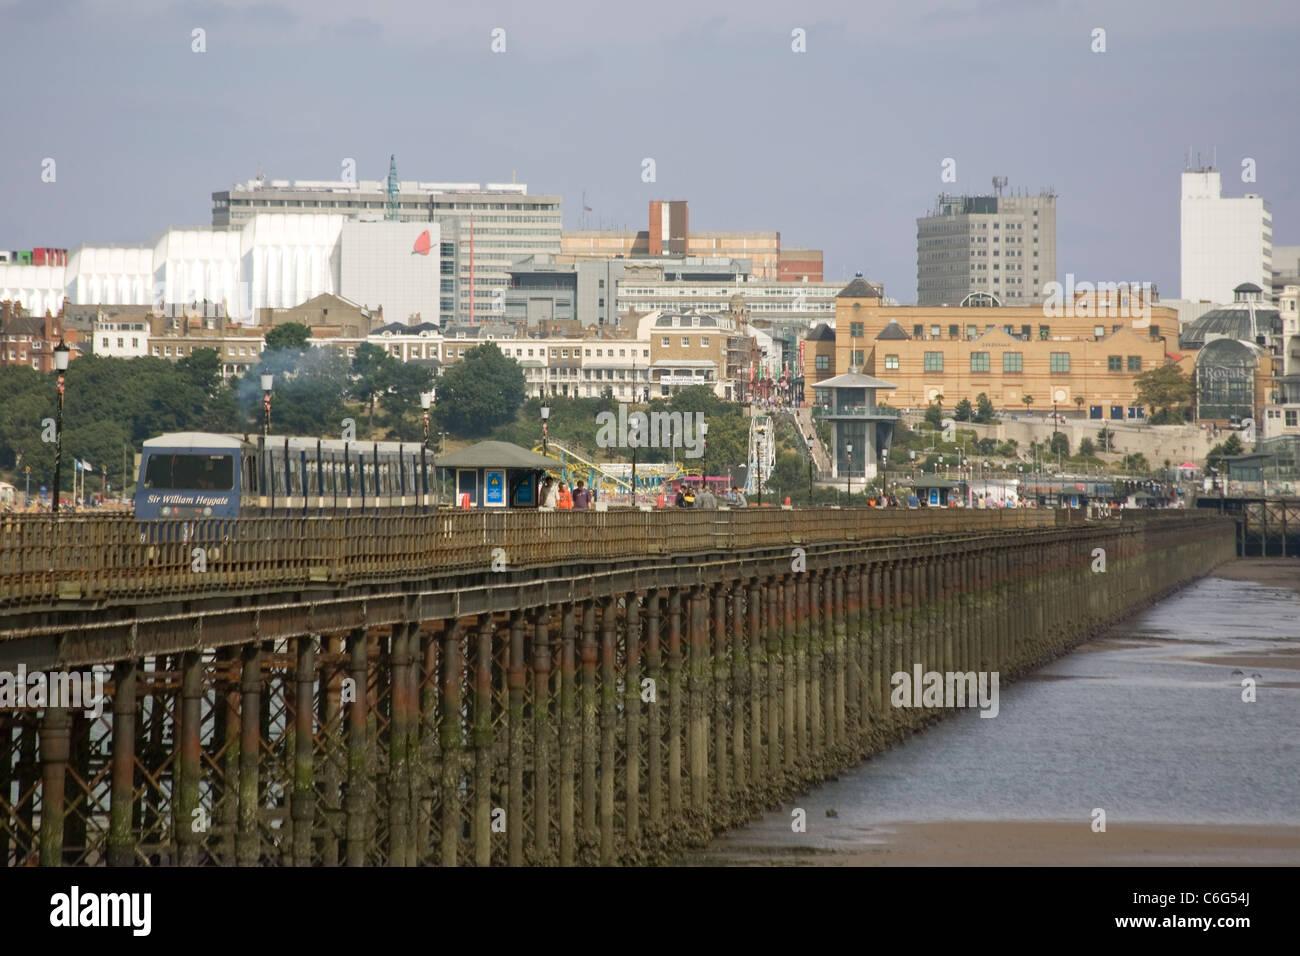 England Essex Southend train on pier - Stock Image